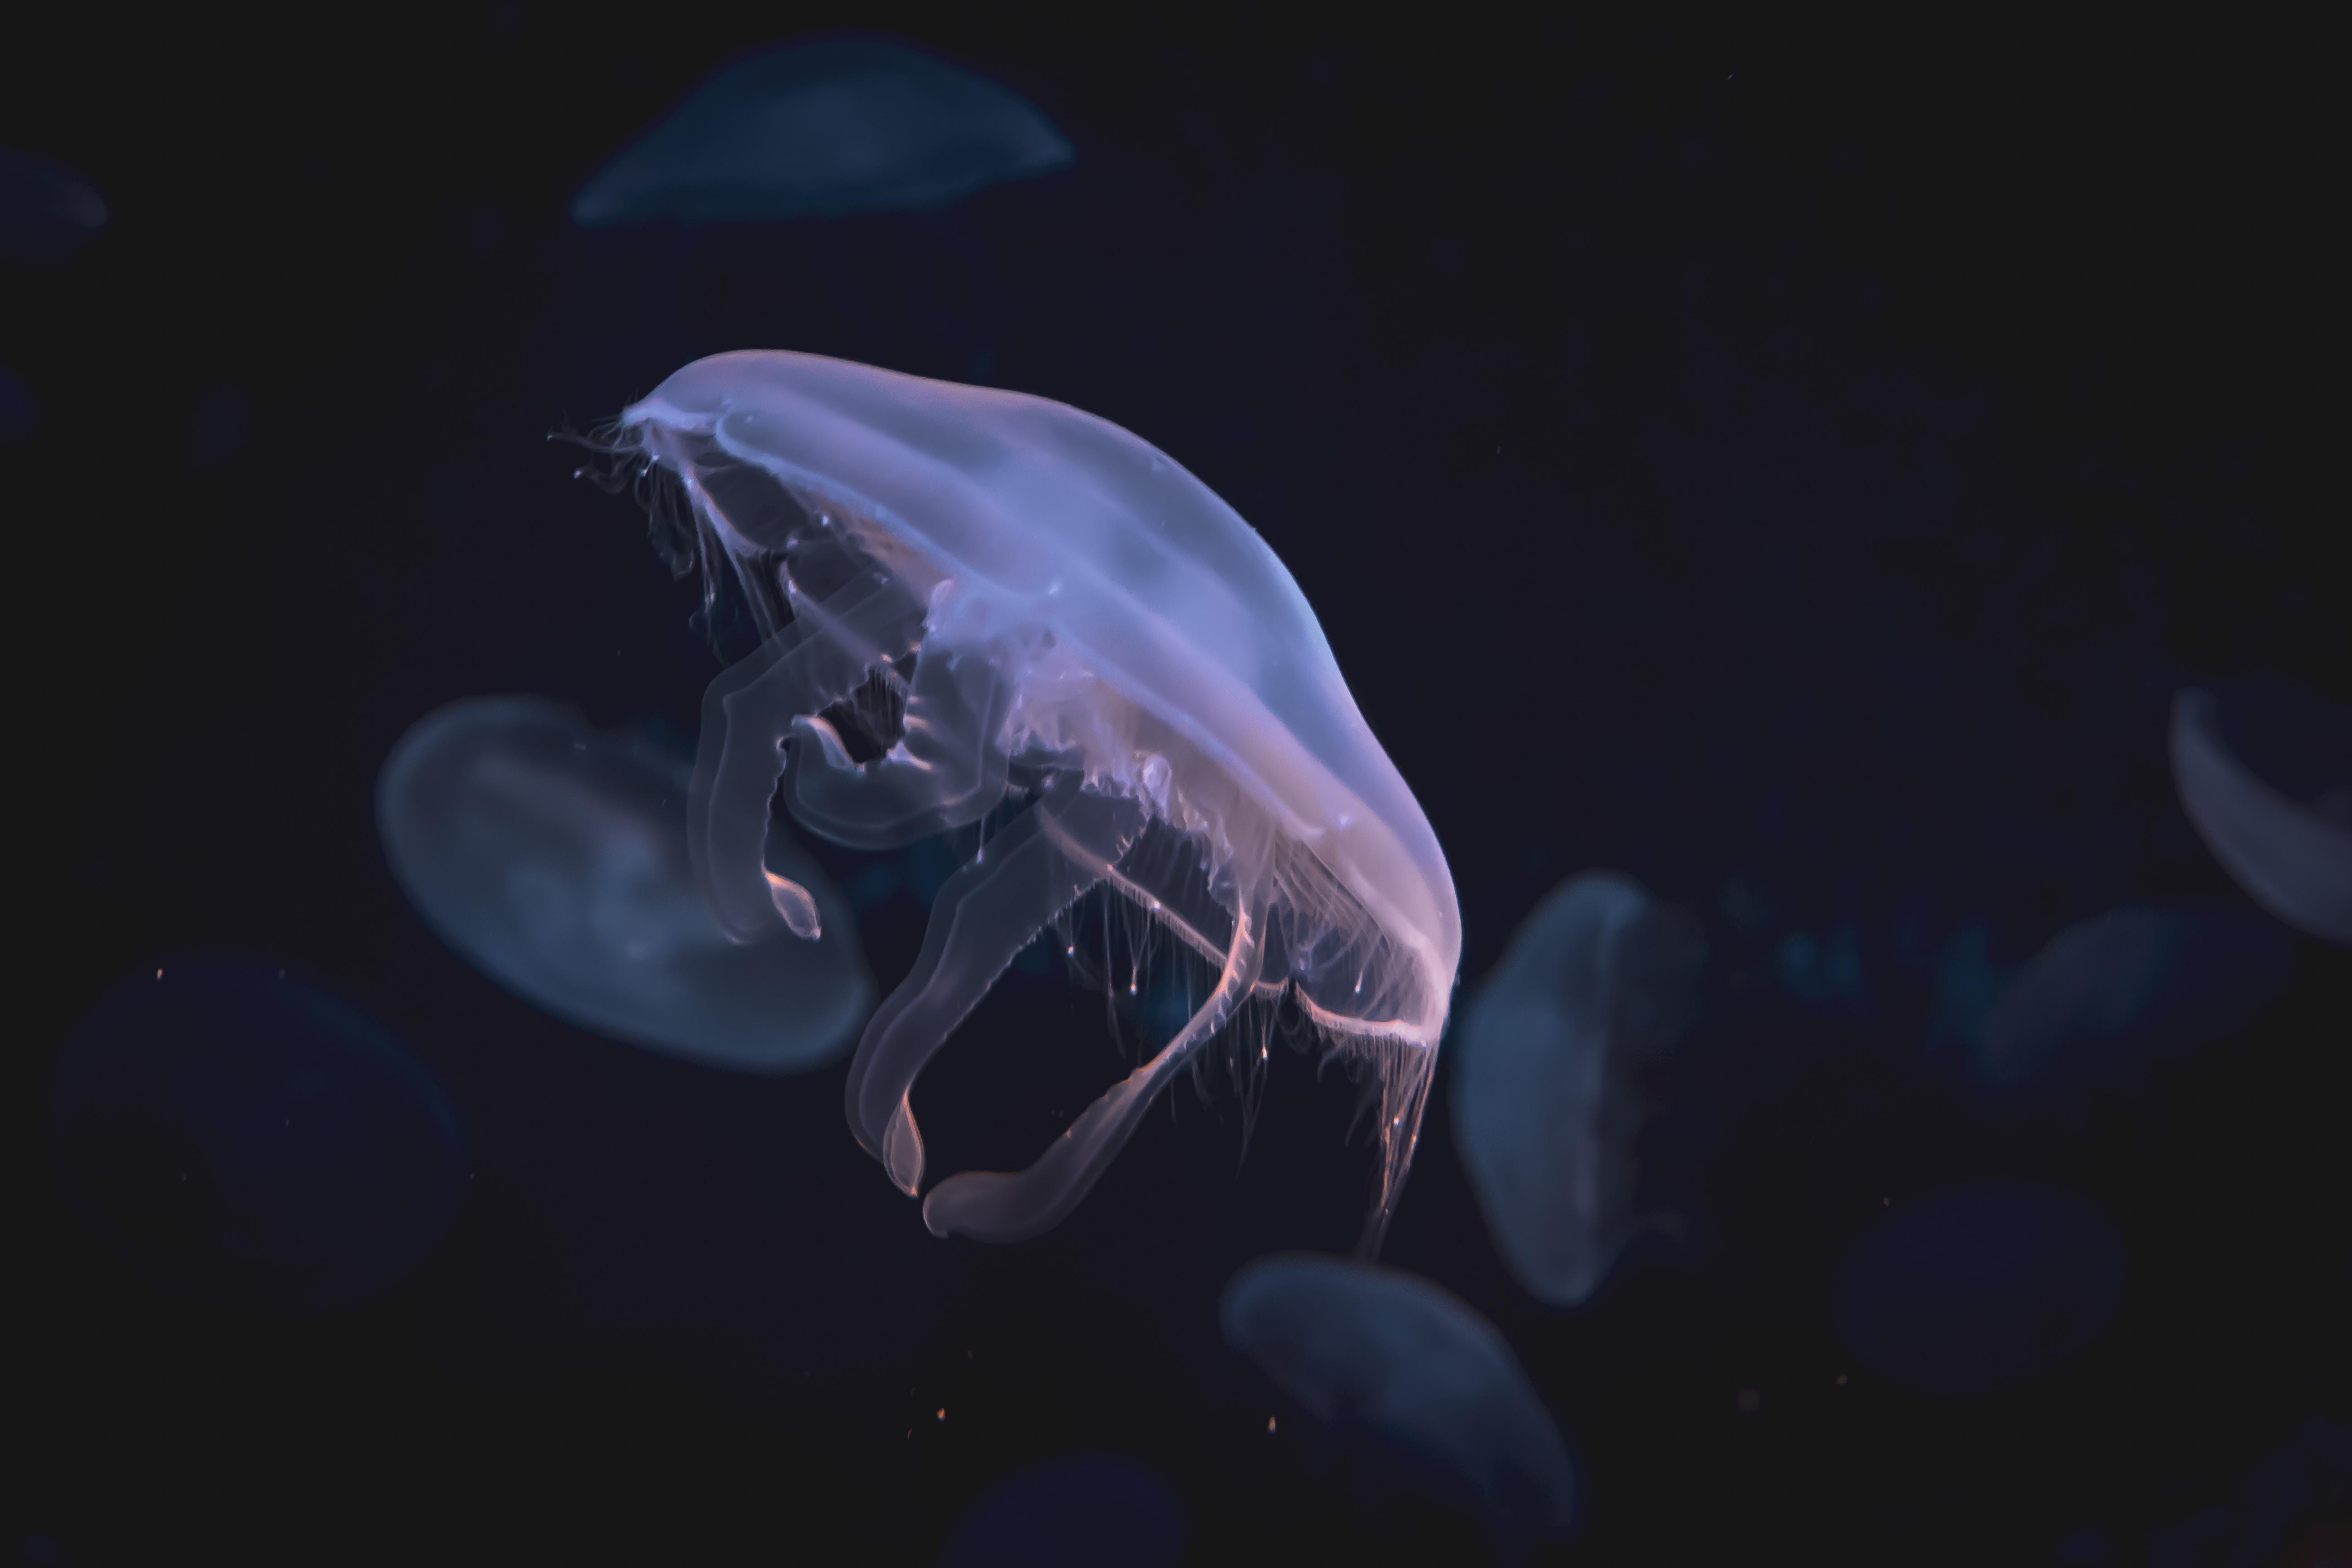 moon jellyfish digital wallpaper